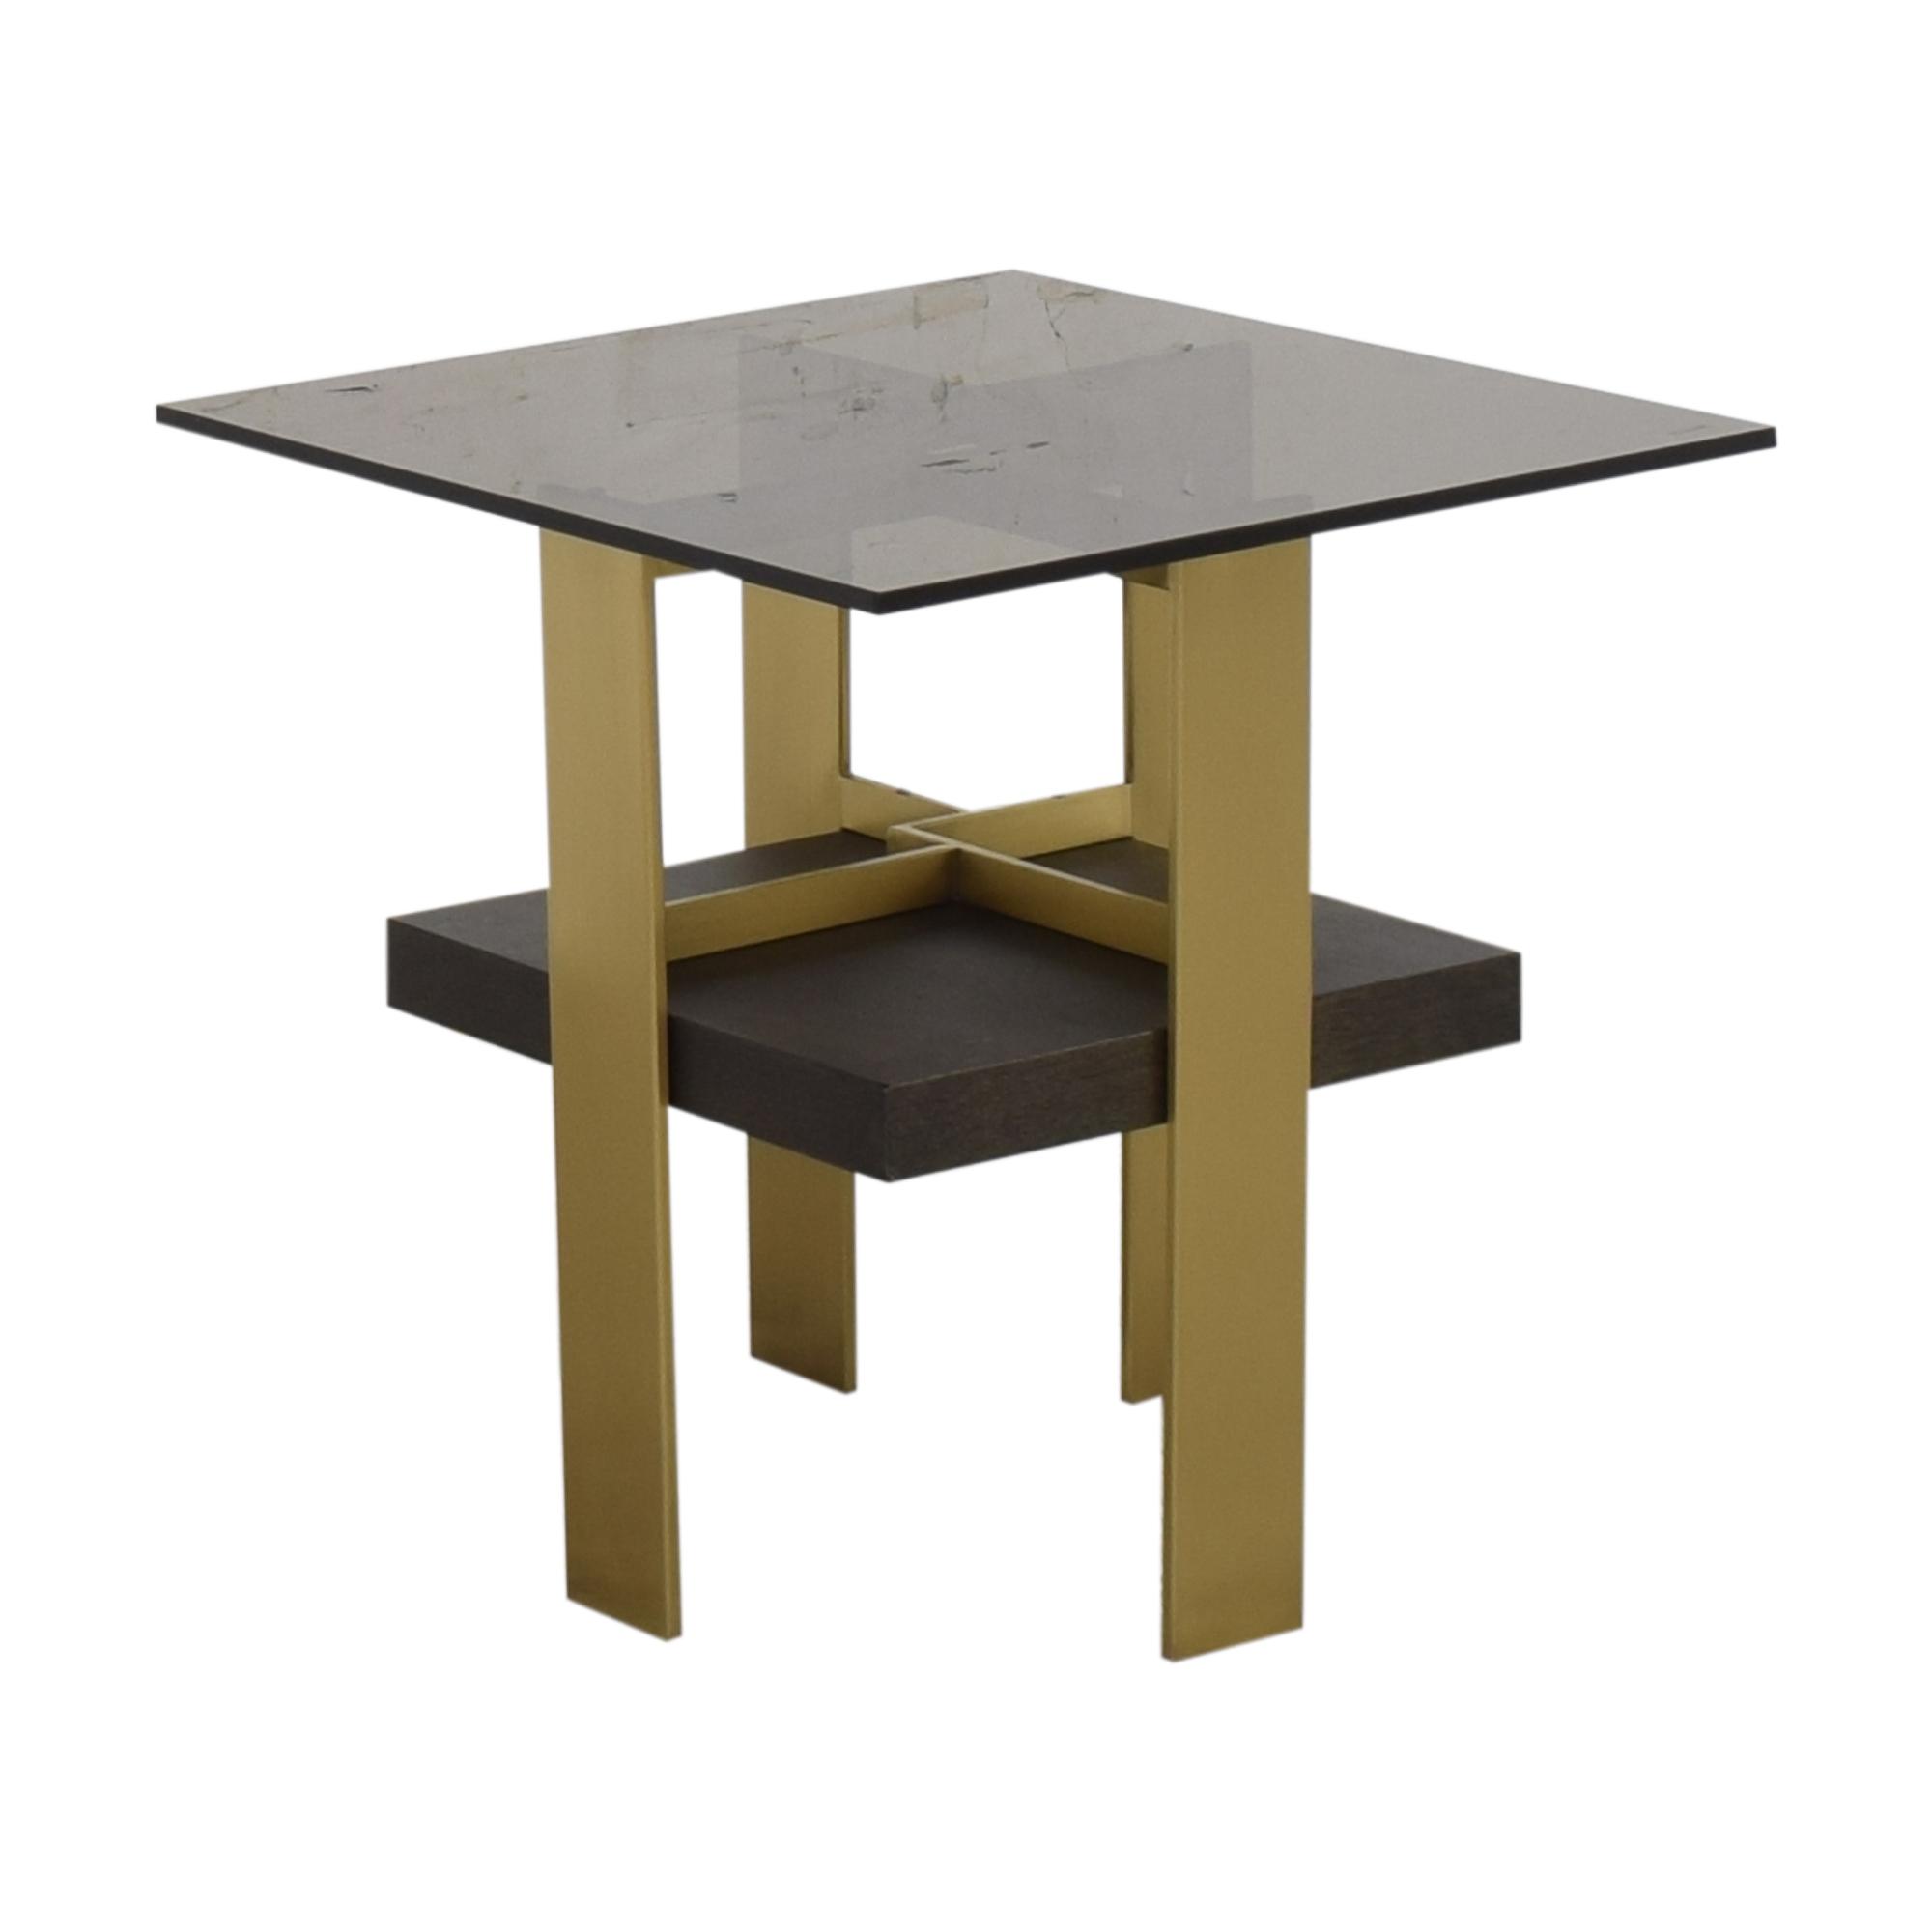 Huffman Koos Huffman Koos Geometric Side Table multi